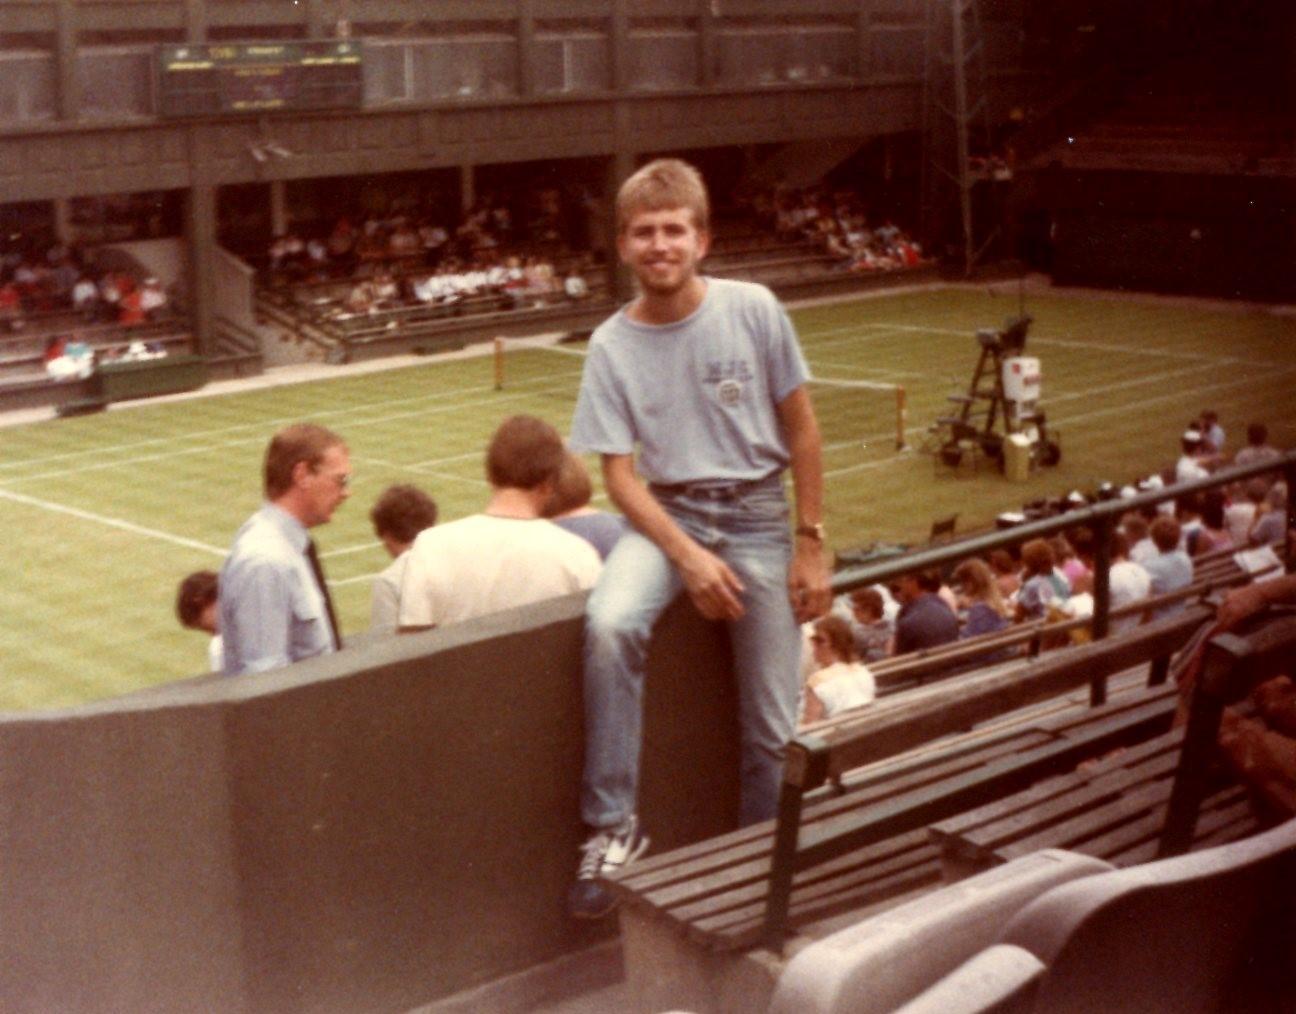 At Wimbledon - July, 1984